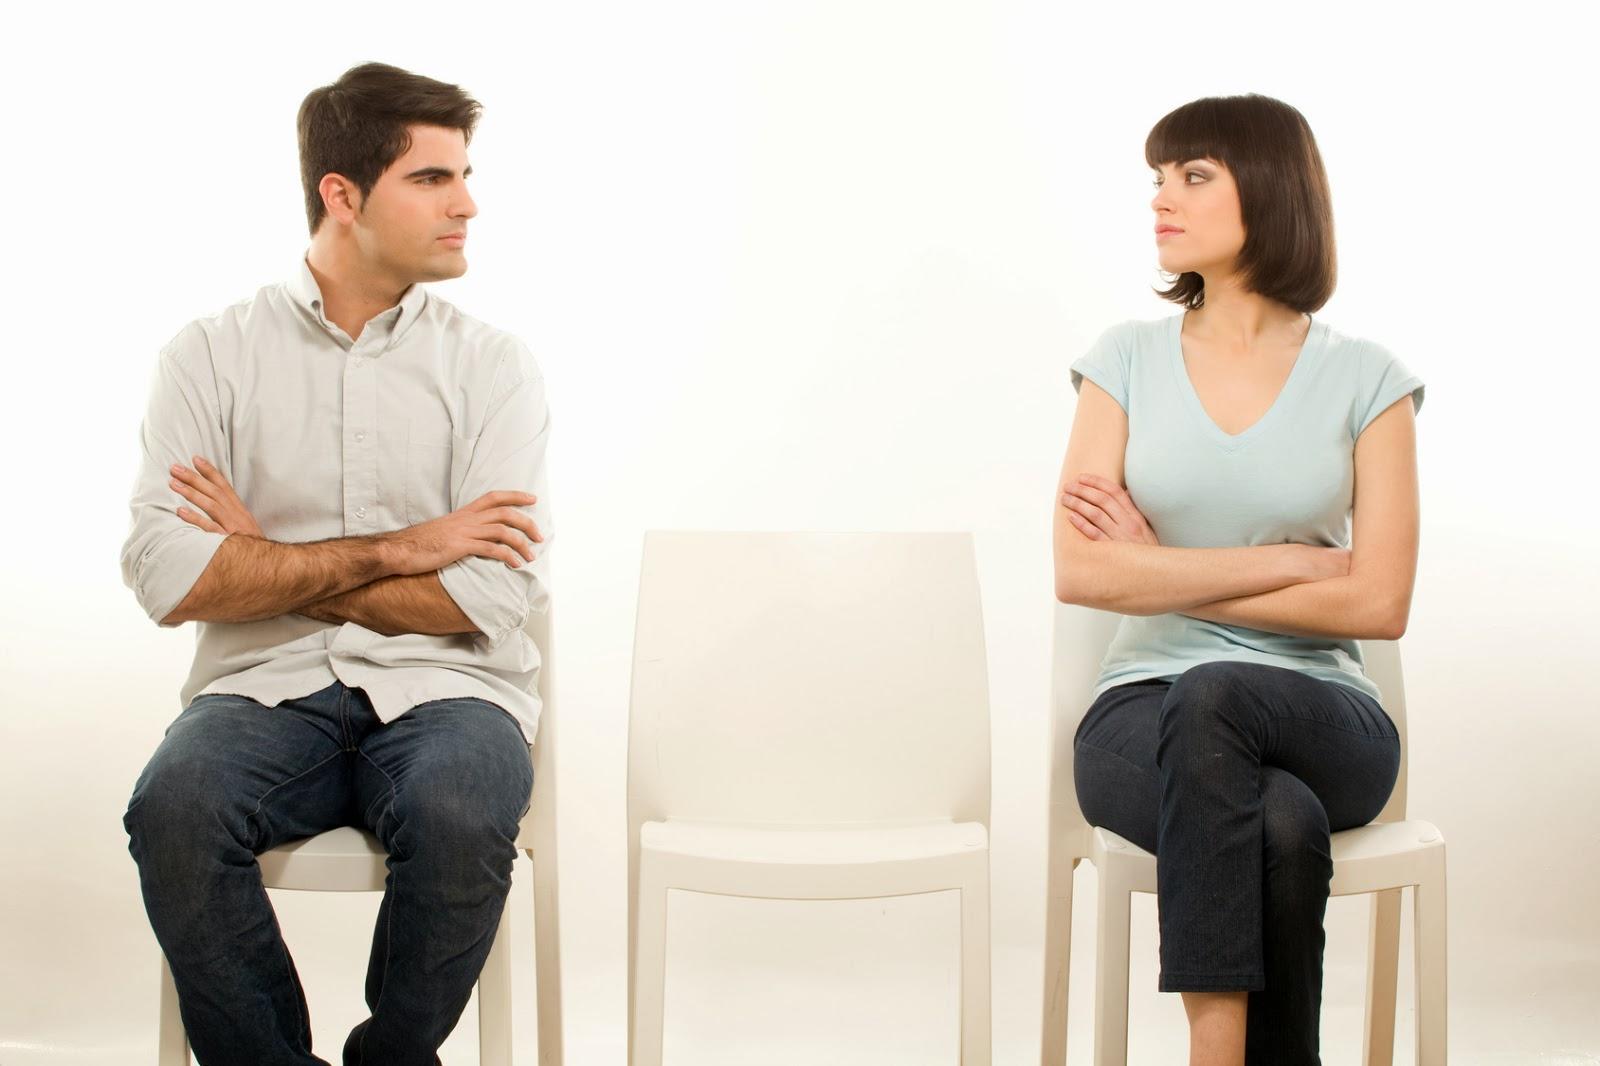 solucionando problemas de pareja